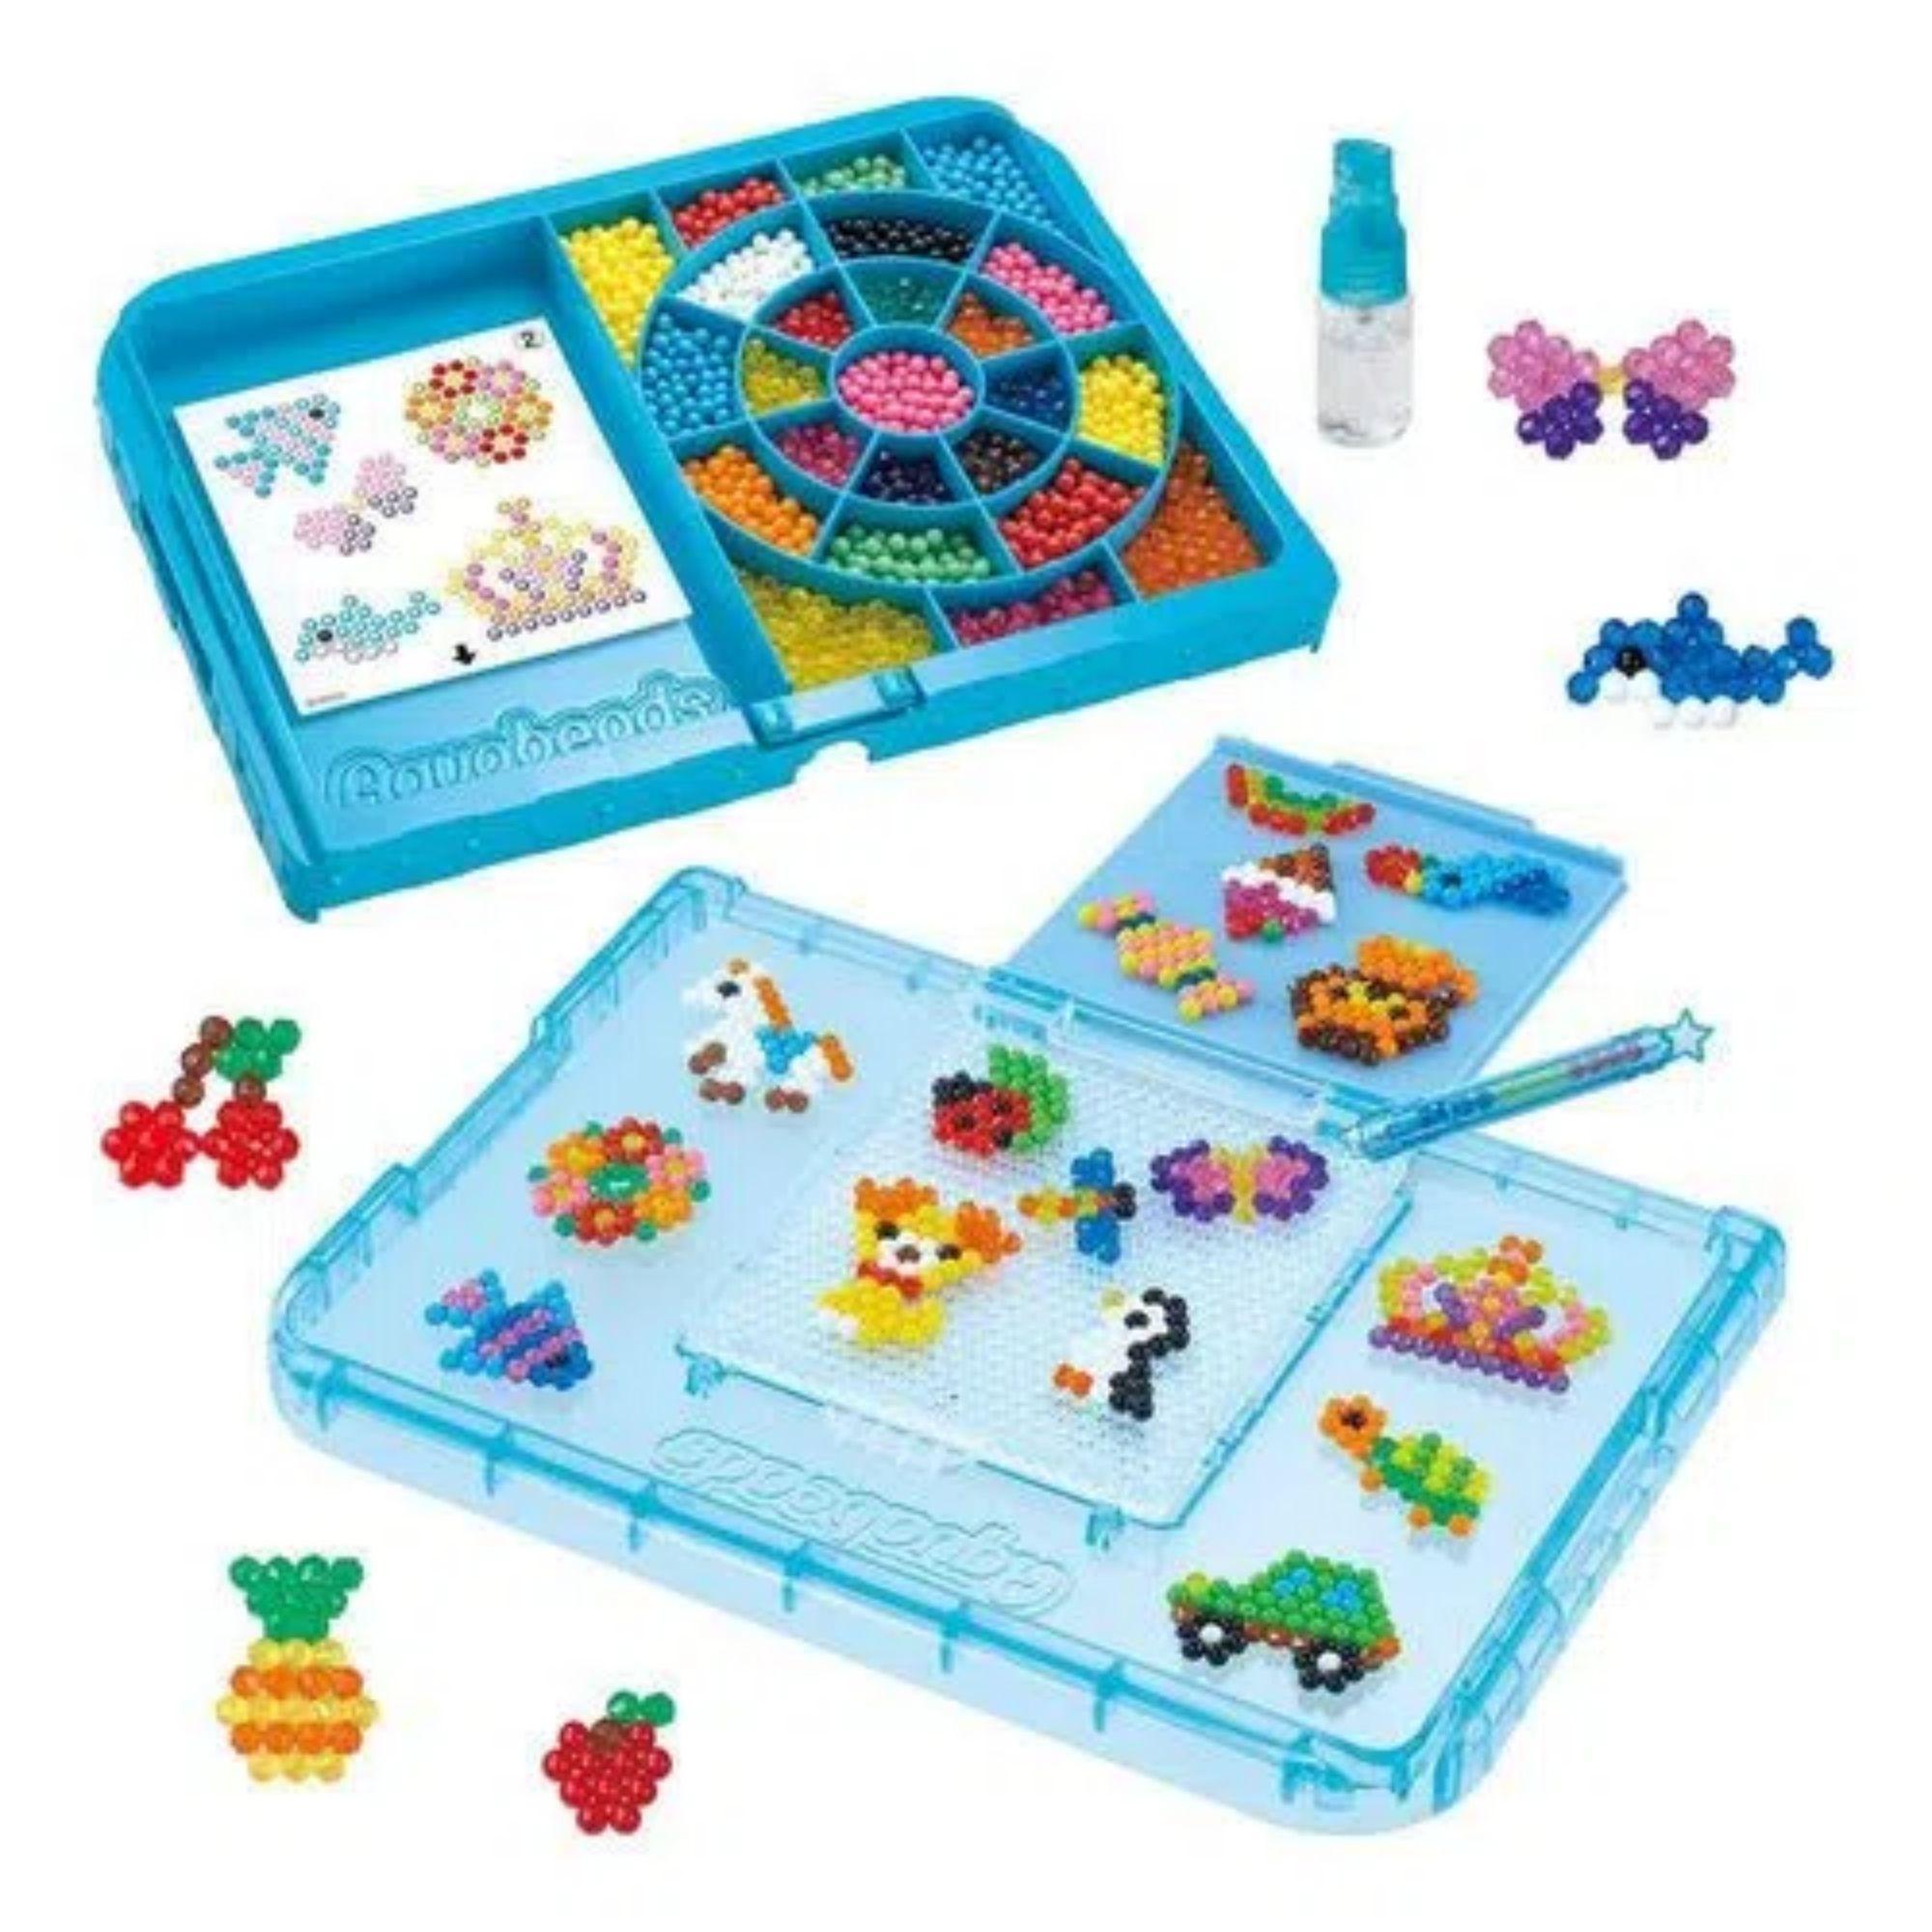 Brinquedo Aquabeads Conjunto Estudio Para Iniciantes Epoch 31380  - Game Land Brinquedos